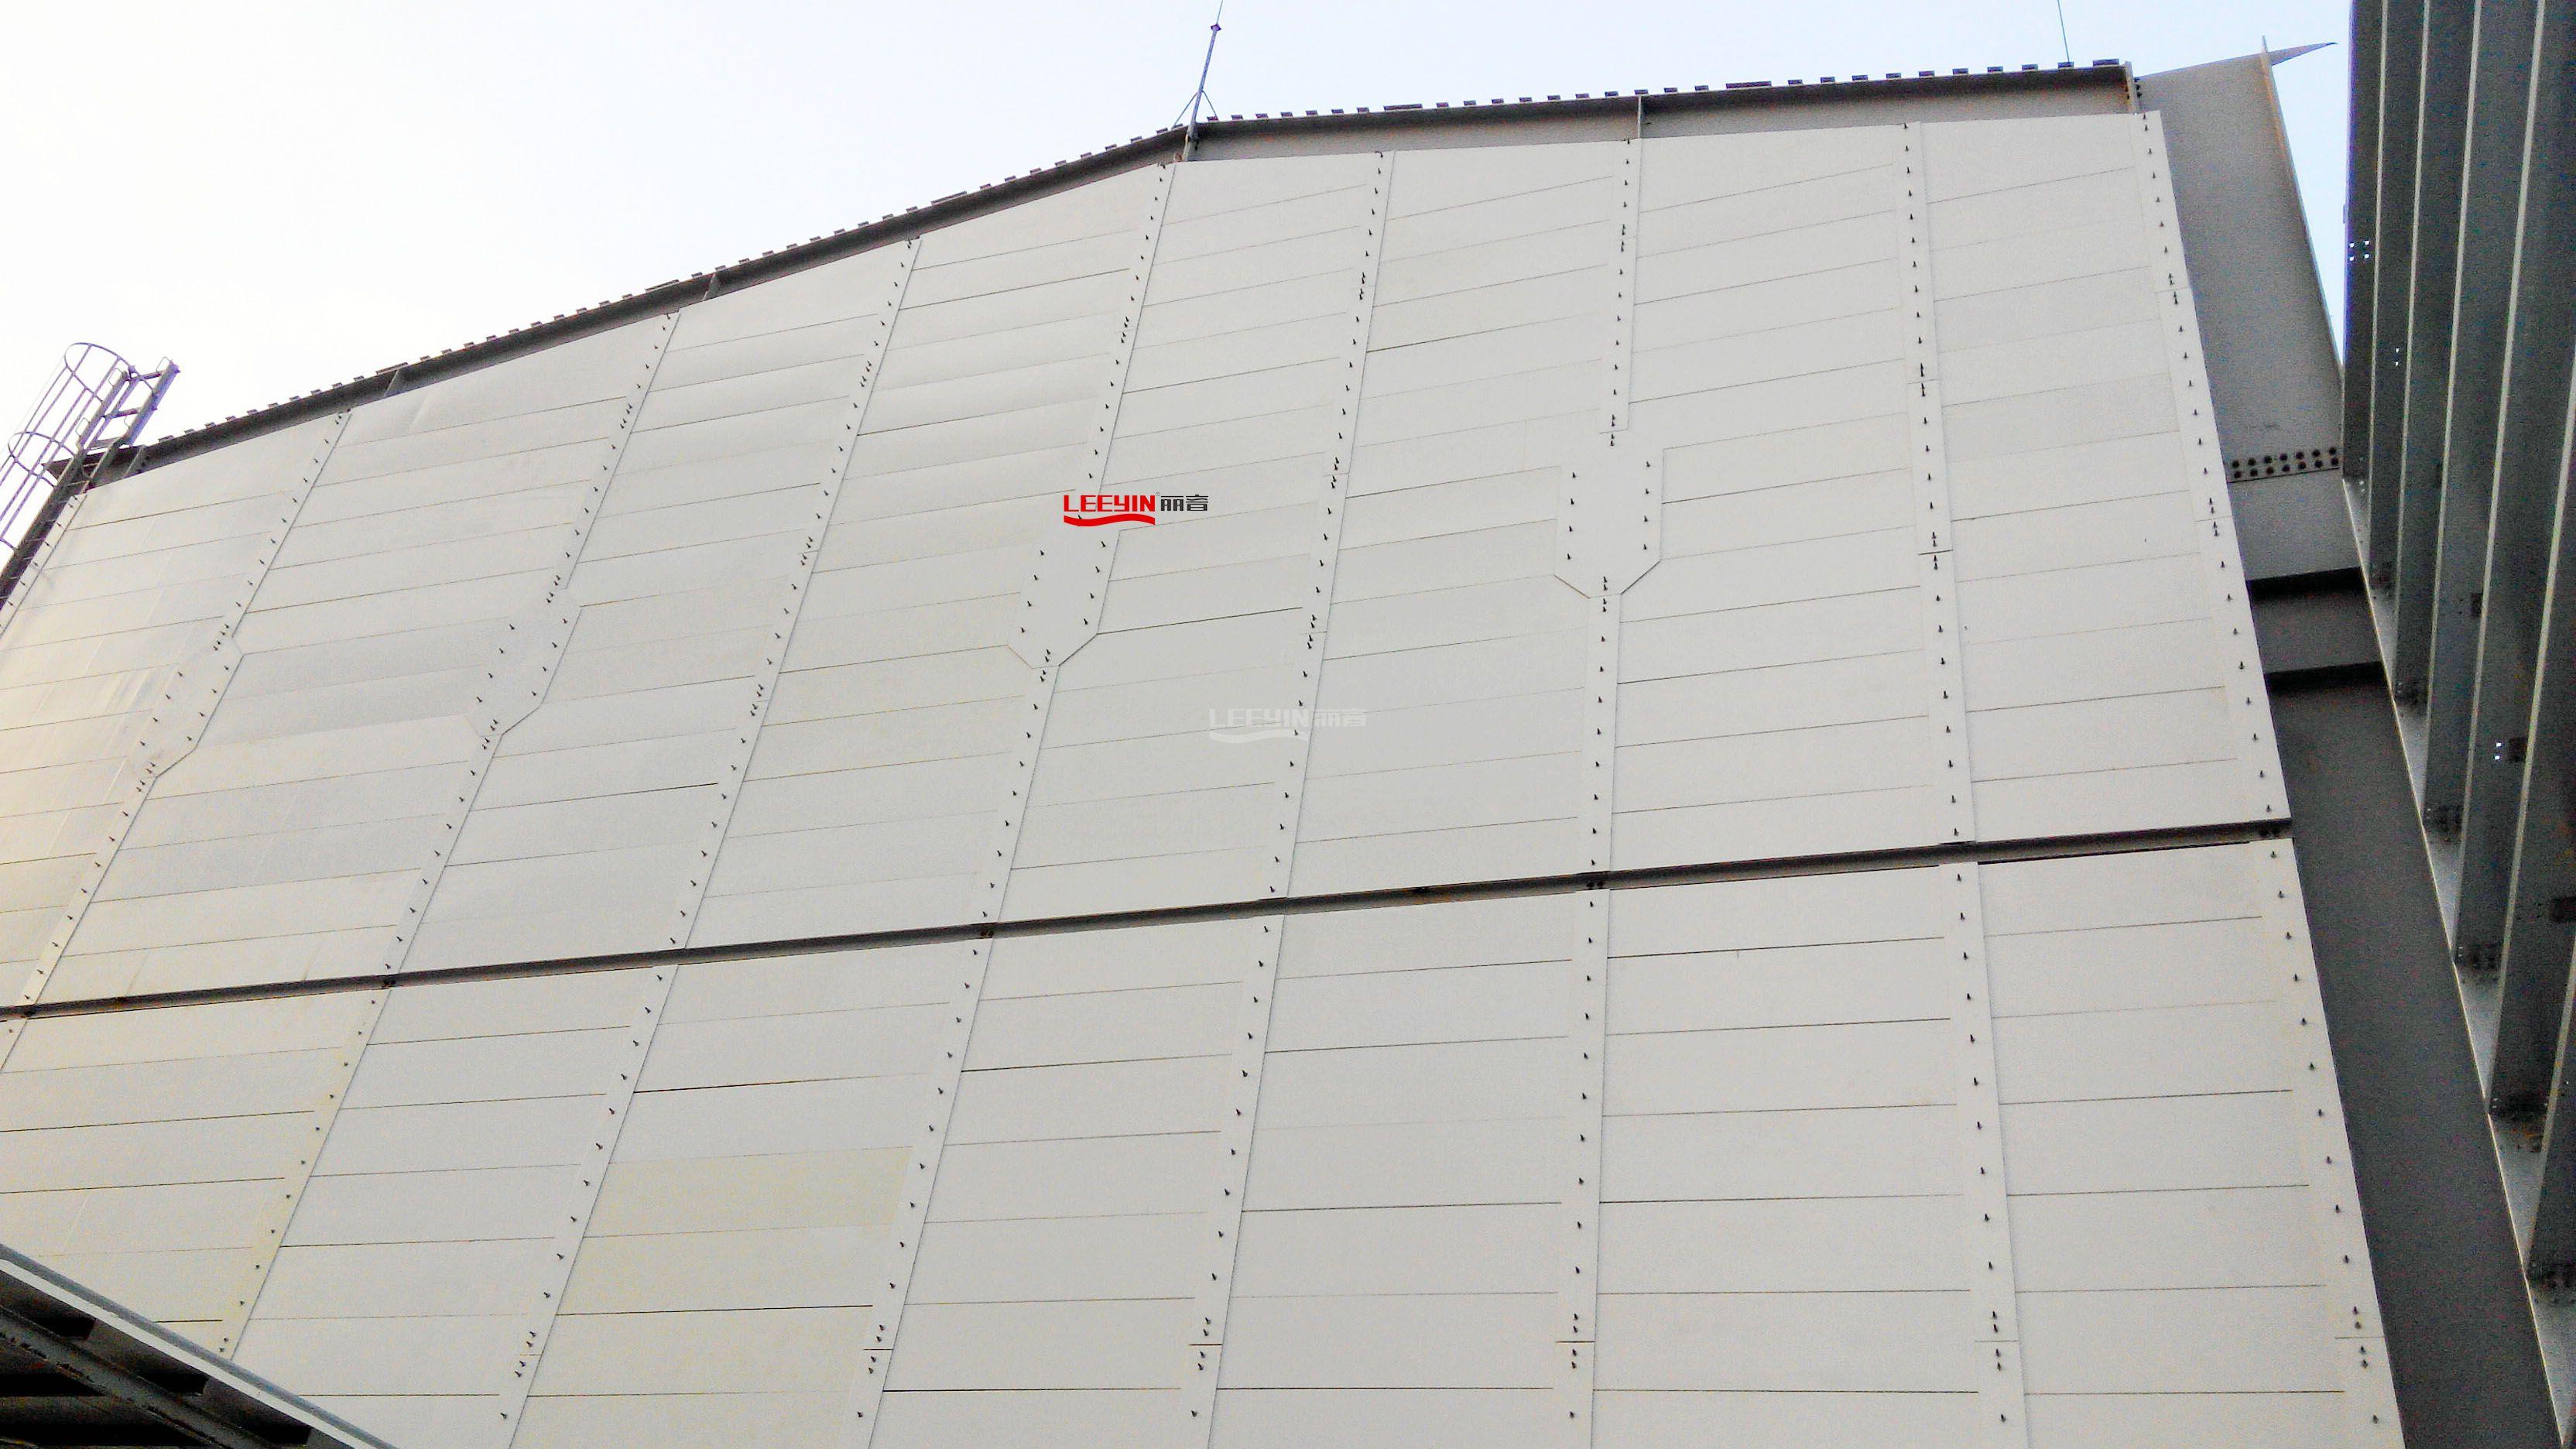 KTV sound proof material sound insulation panels night club